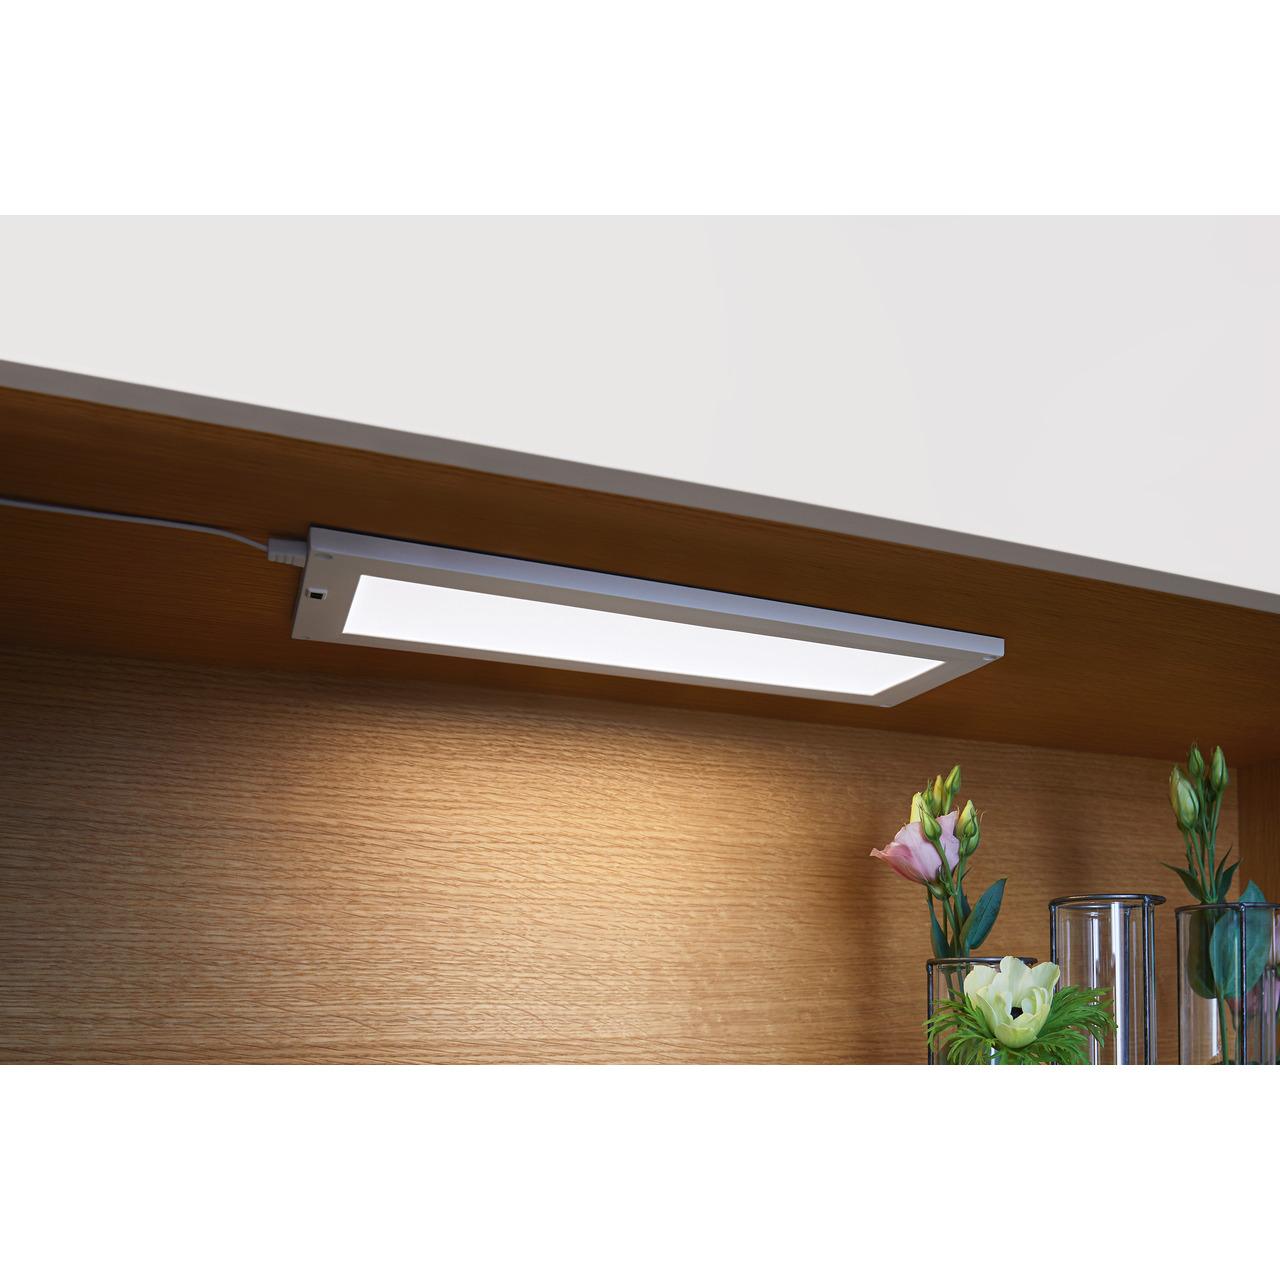 Ledvance 5-W-LED-Panel CABINET- 300 x 100 mm- mit Bewegungssensor- stufenlos dimmbar- IP20